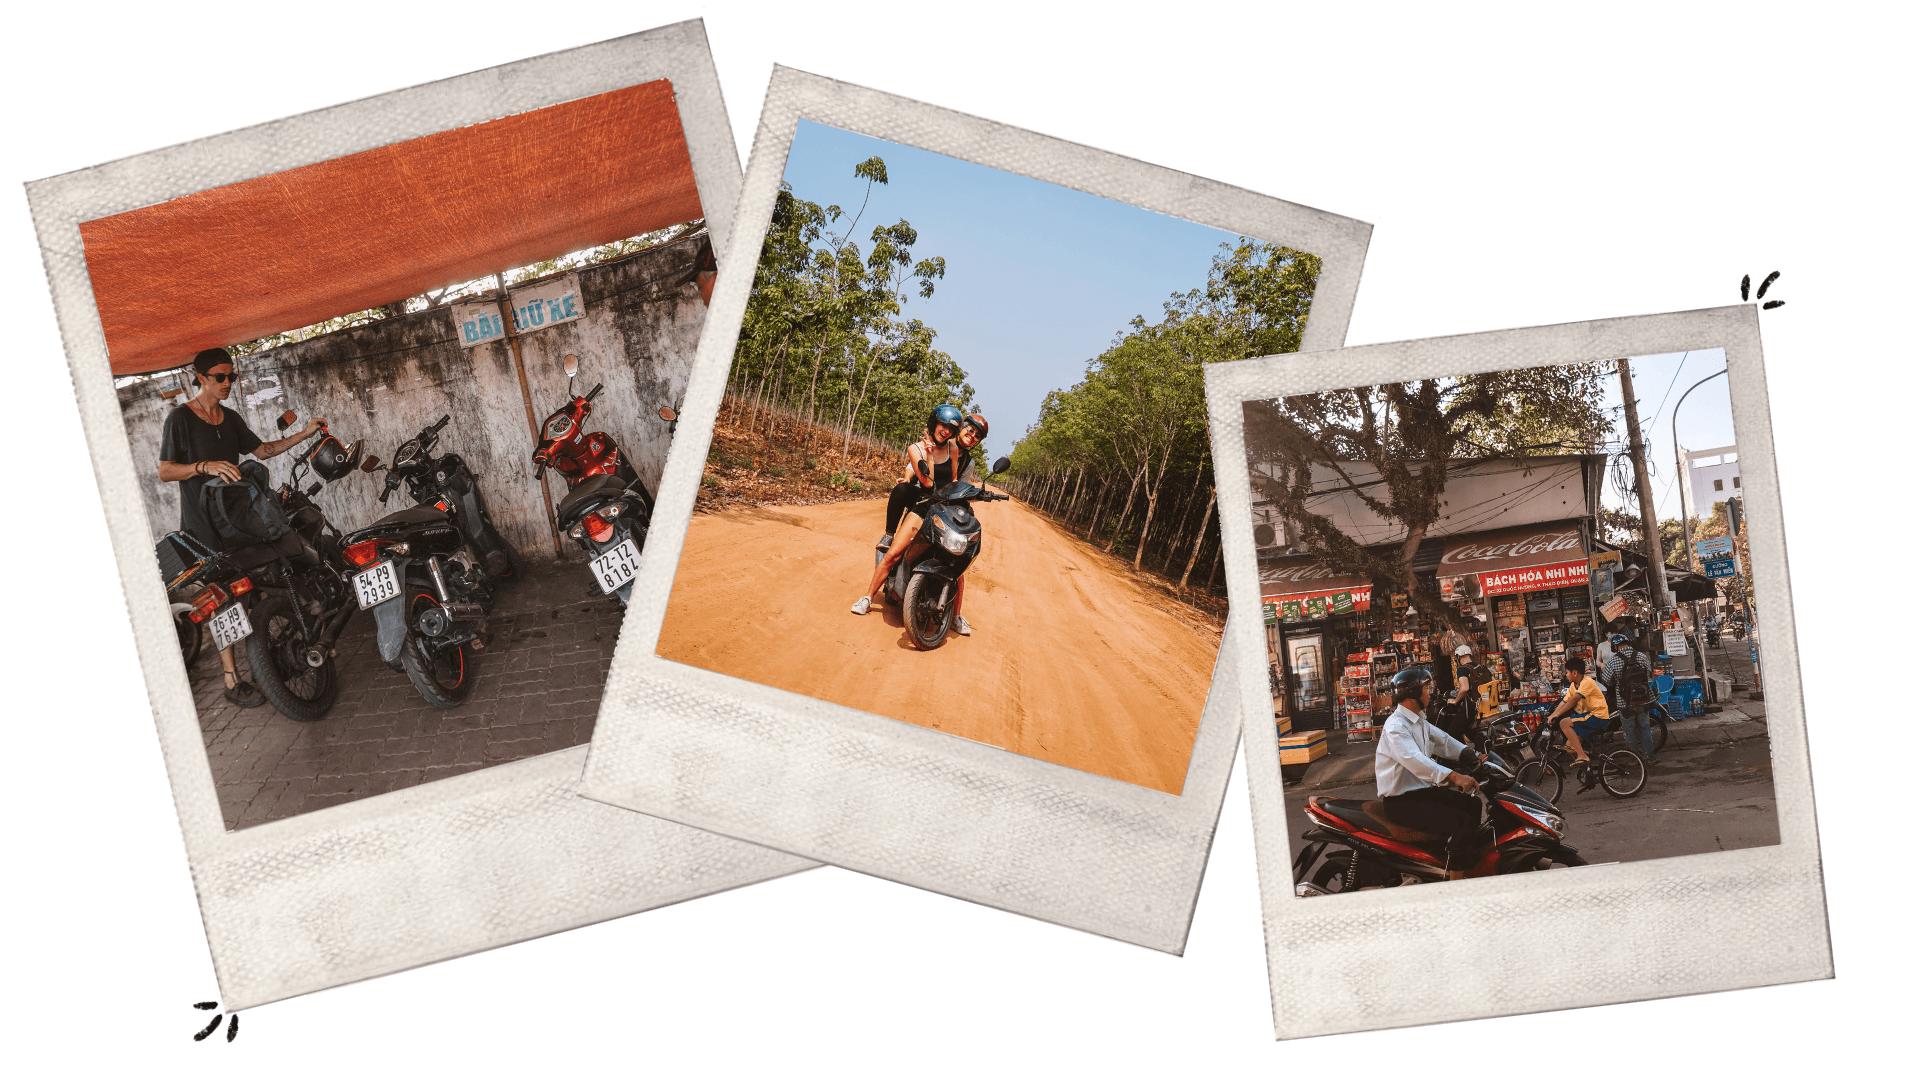 learning to motorbike in Vietnam Saigon HCMC motorbiking lessons